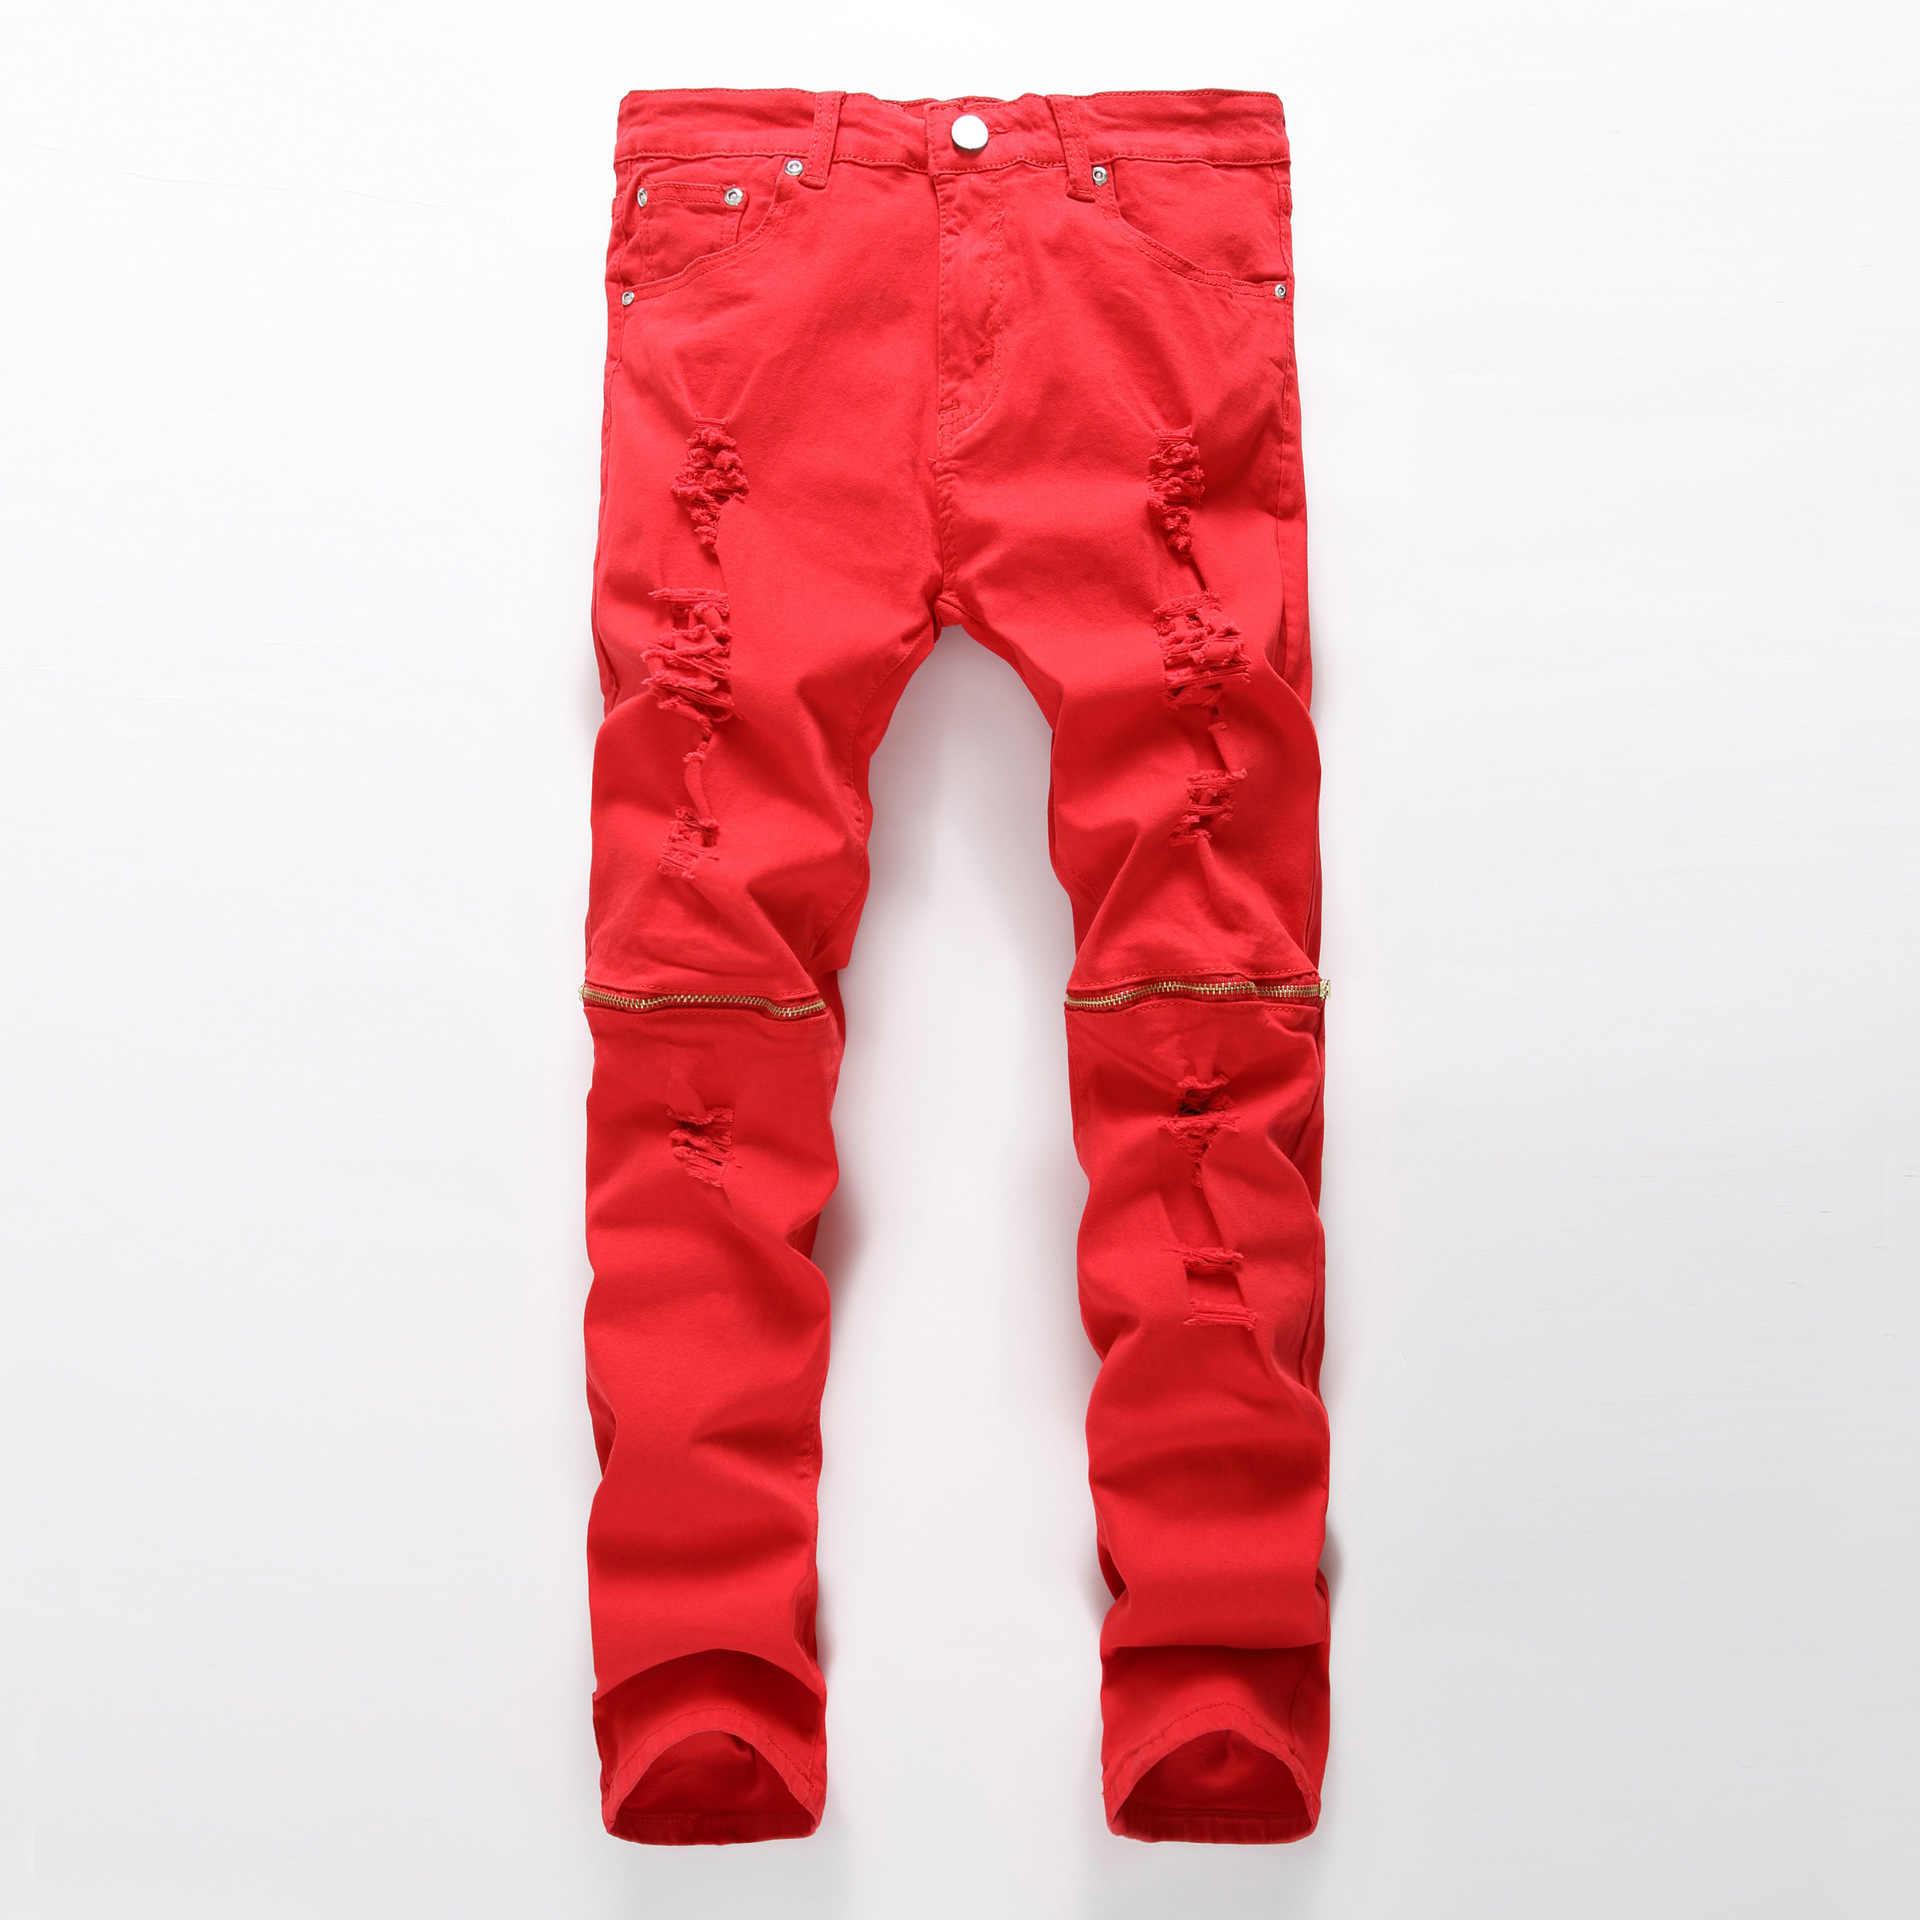 2019 herfst mannen Casual Denim Broek Klassieke Cowboys Jong gat rits jeans Slim mannen broek Man zwart rood witte jeans broek